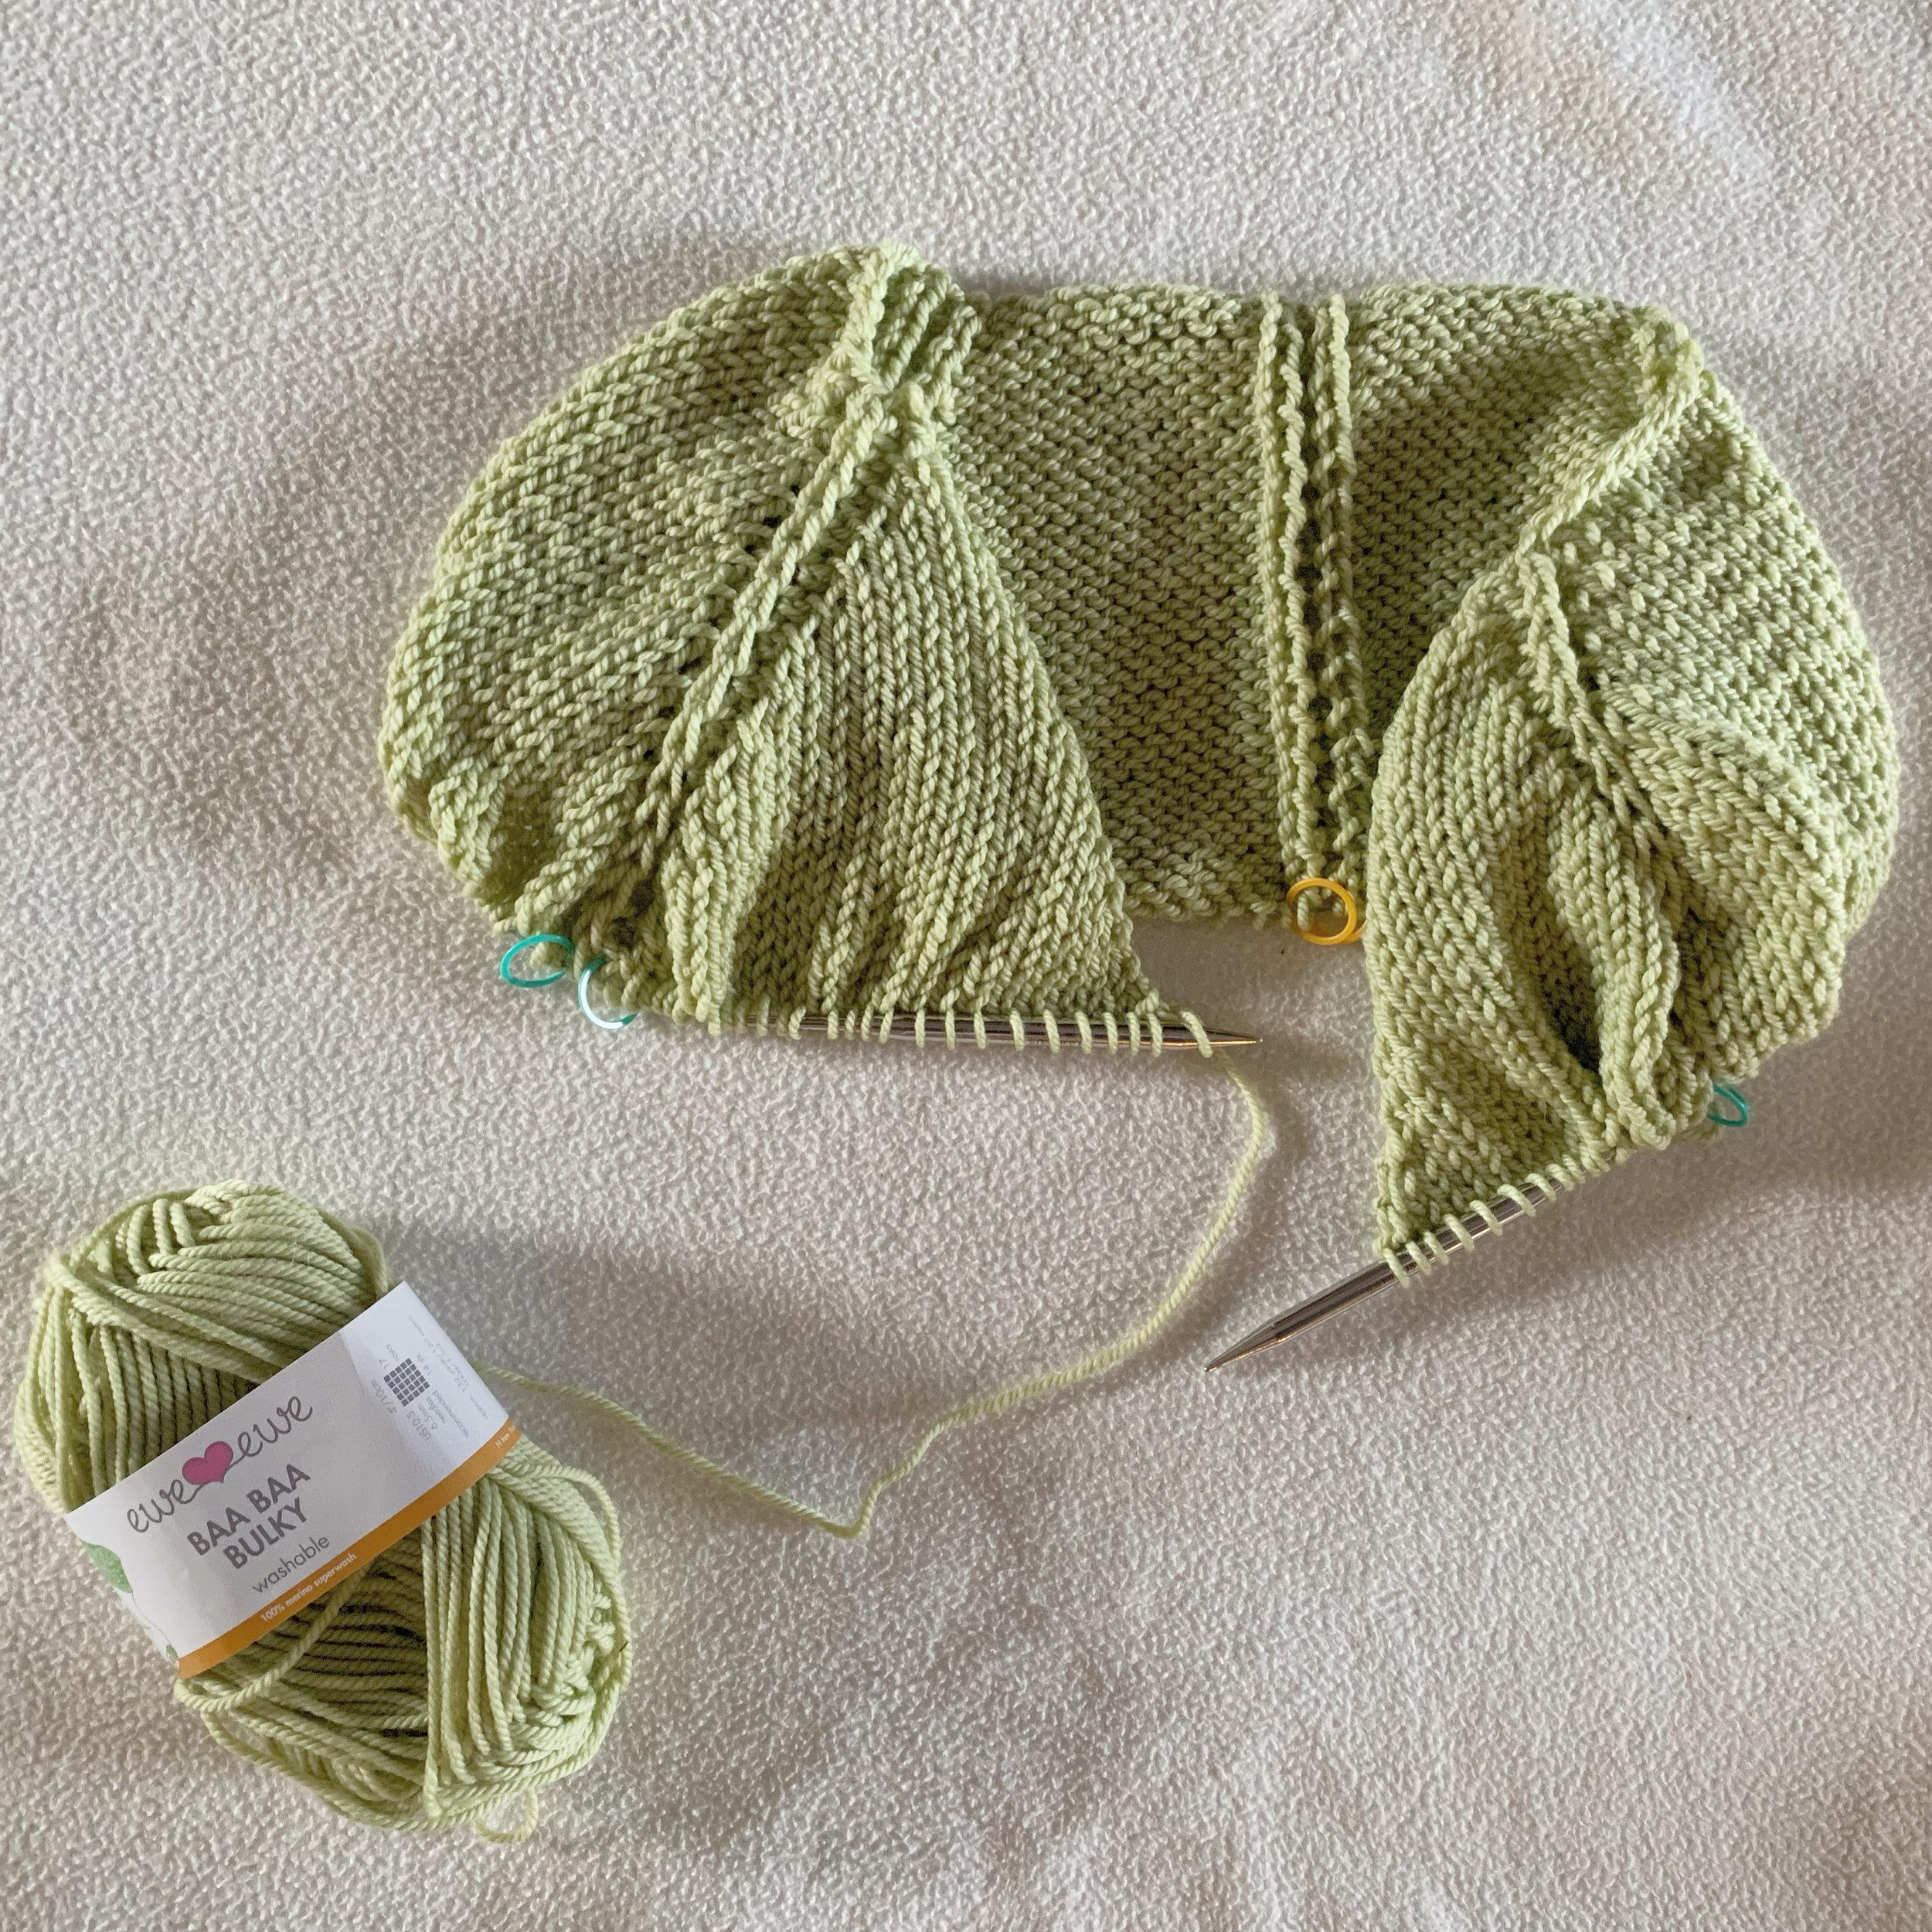 Working on my Ursa sweater in Soft Sage Baa Baa Bulky merino yarn